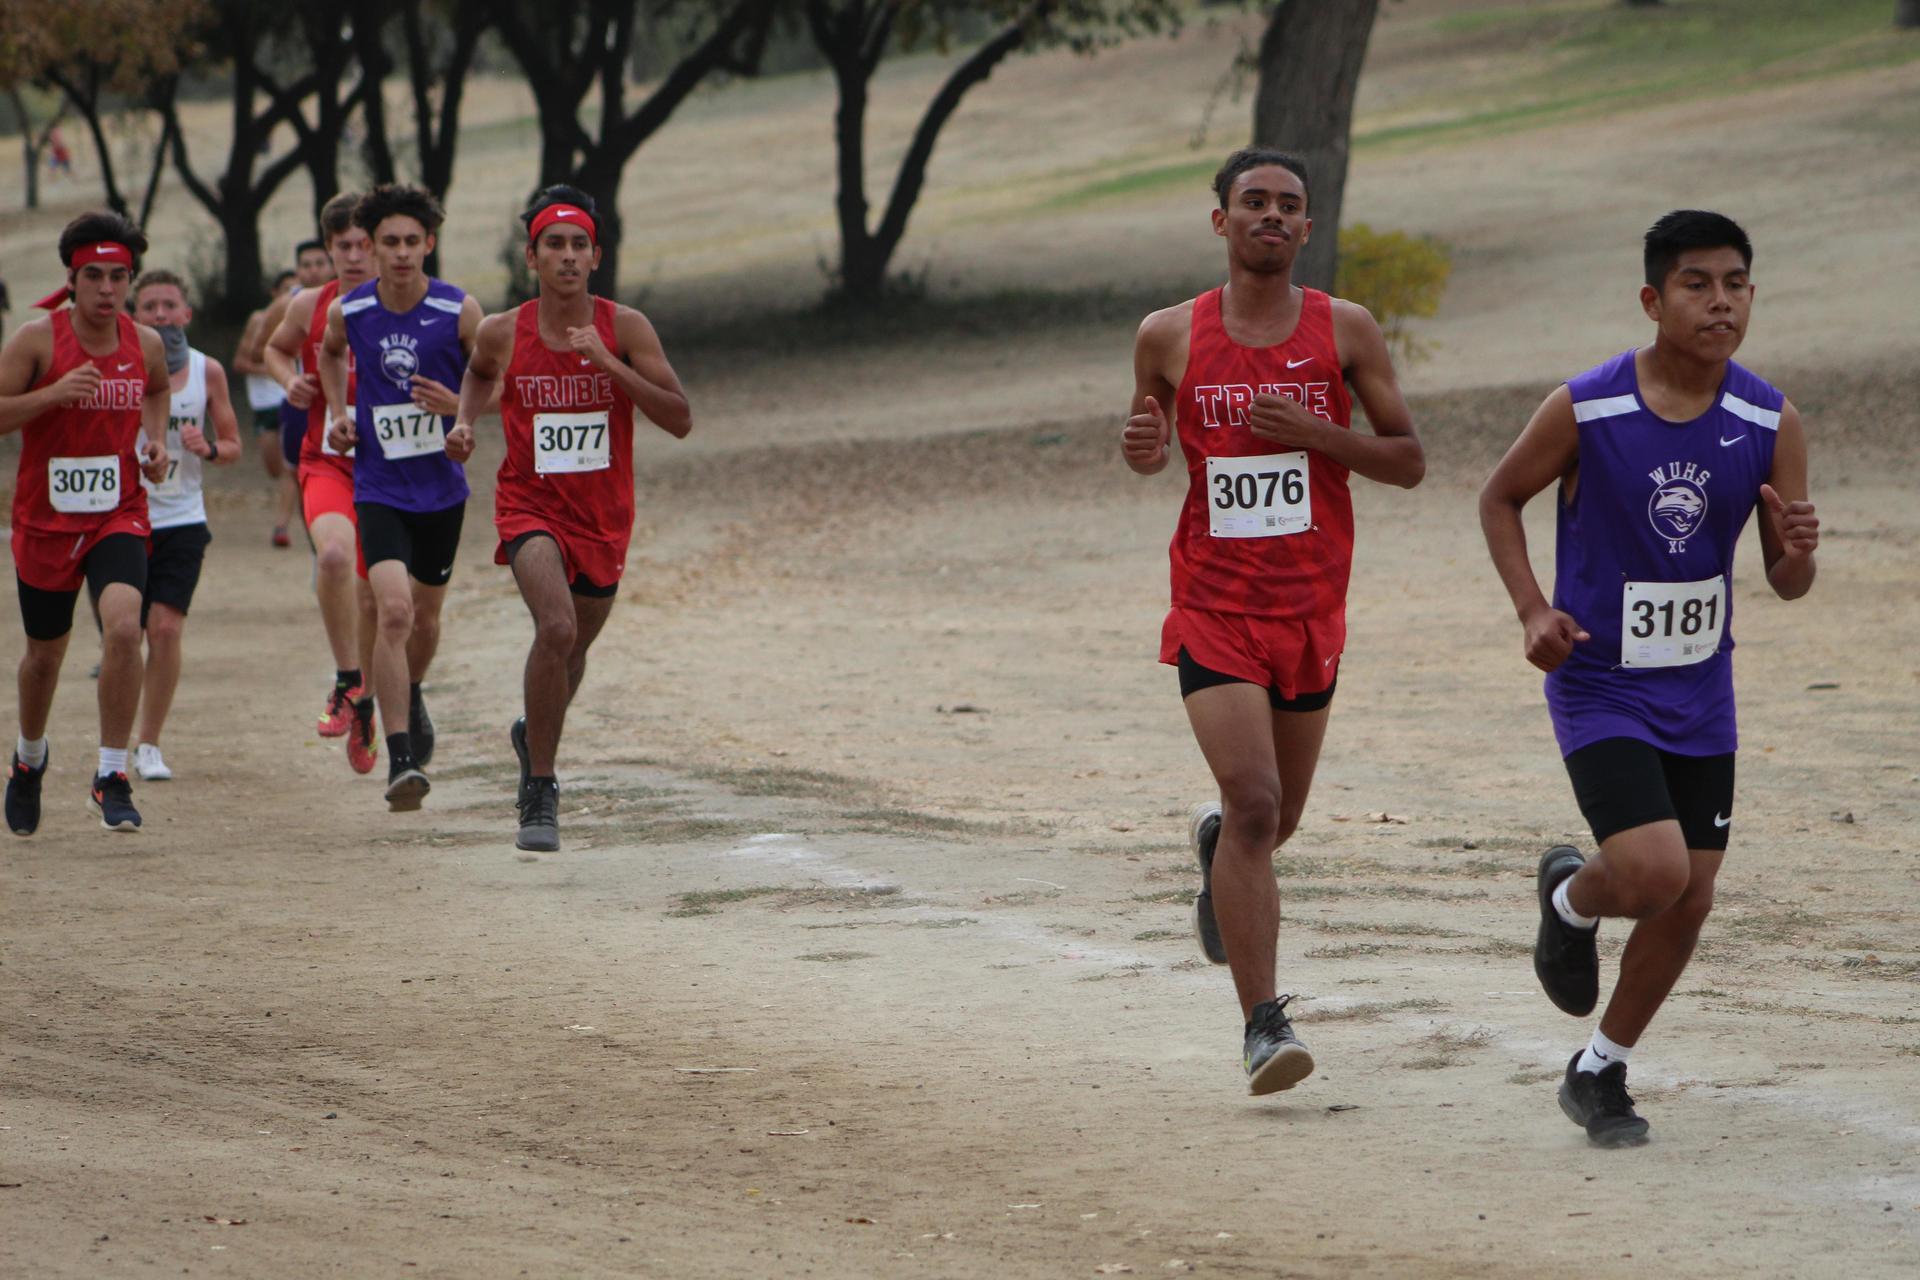 Lawerence Luna, Nicholas Martinez, and Raymond Mendoza racing at woodward park